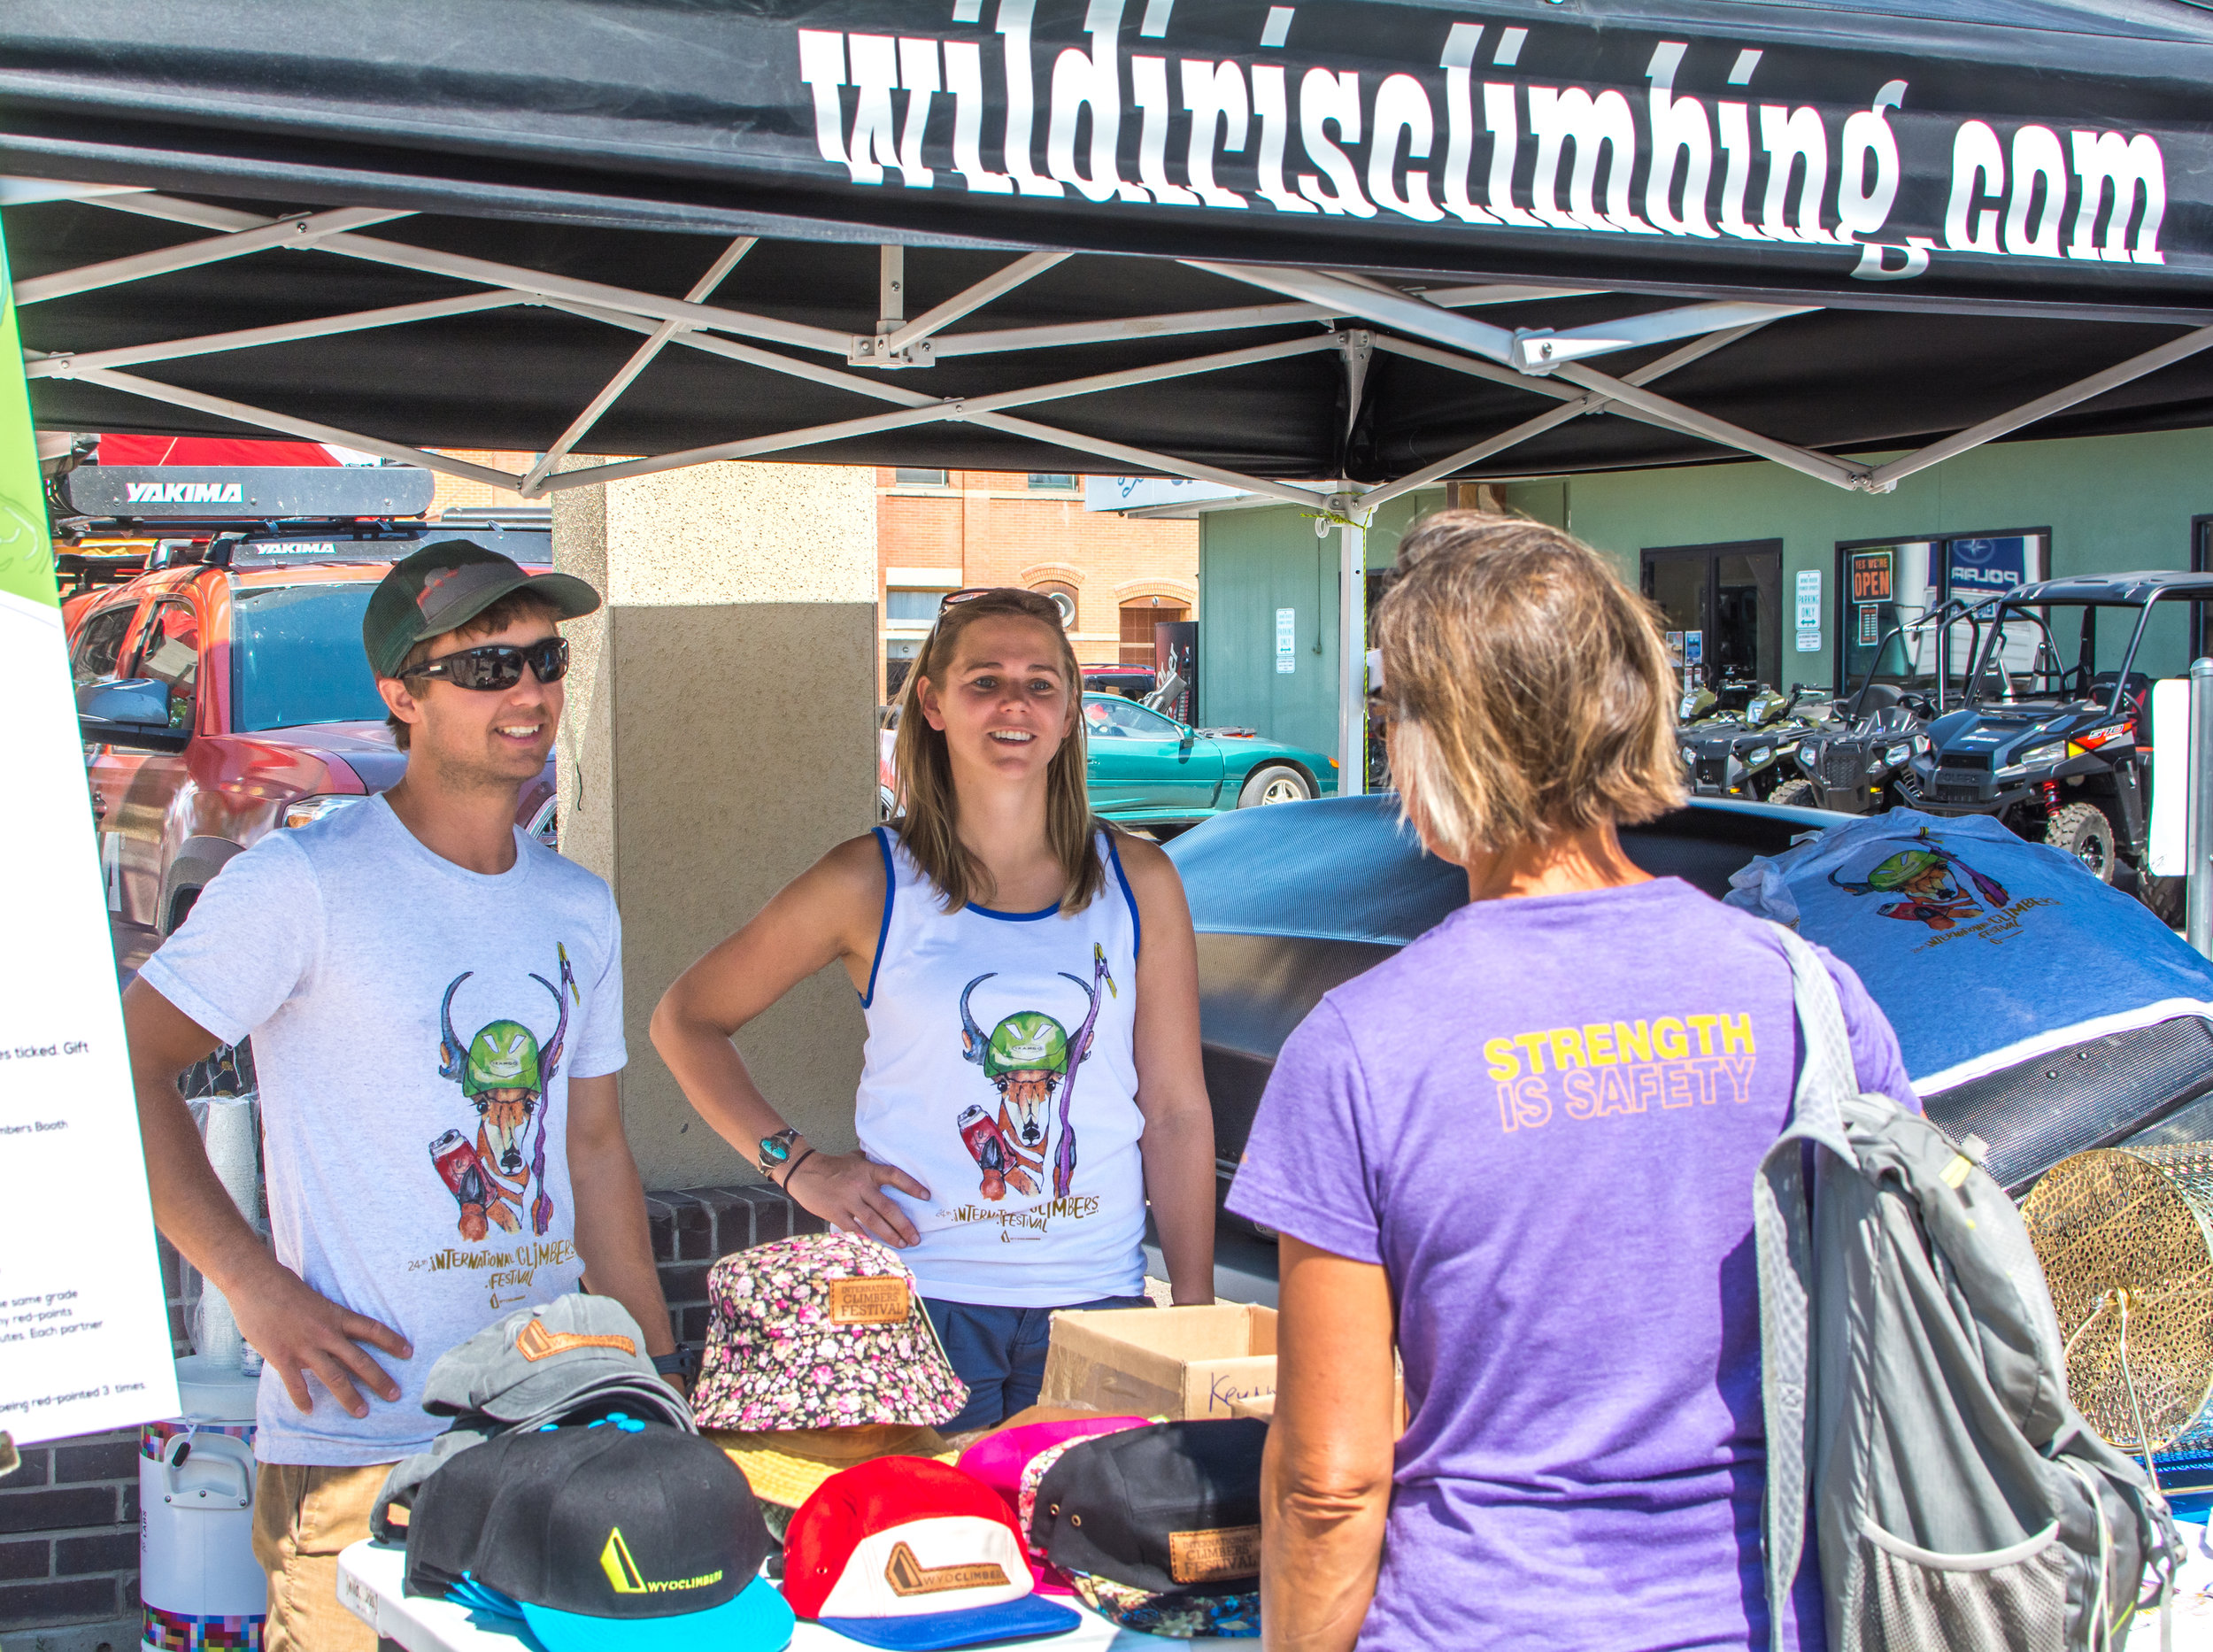 Registration booth at Wild Iris Mountain Sports